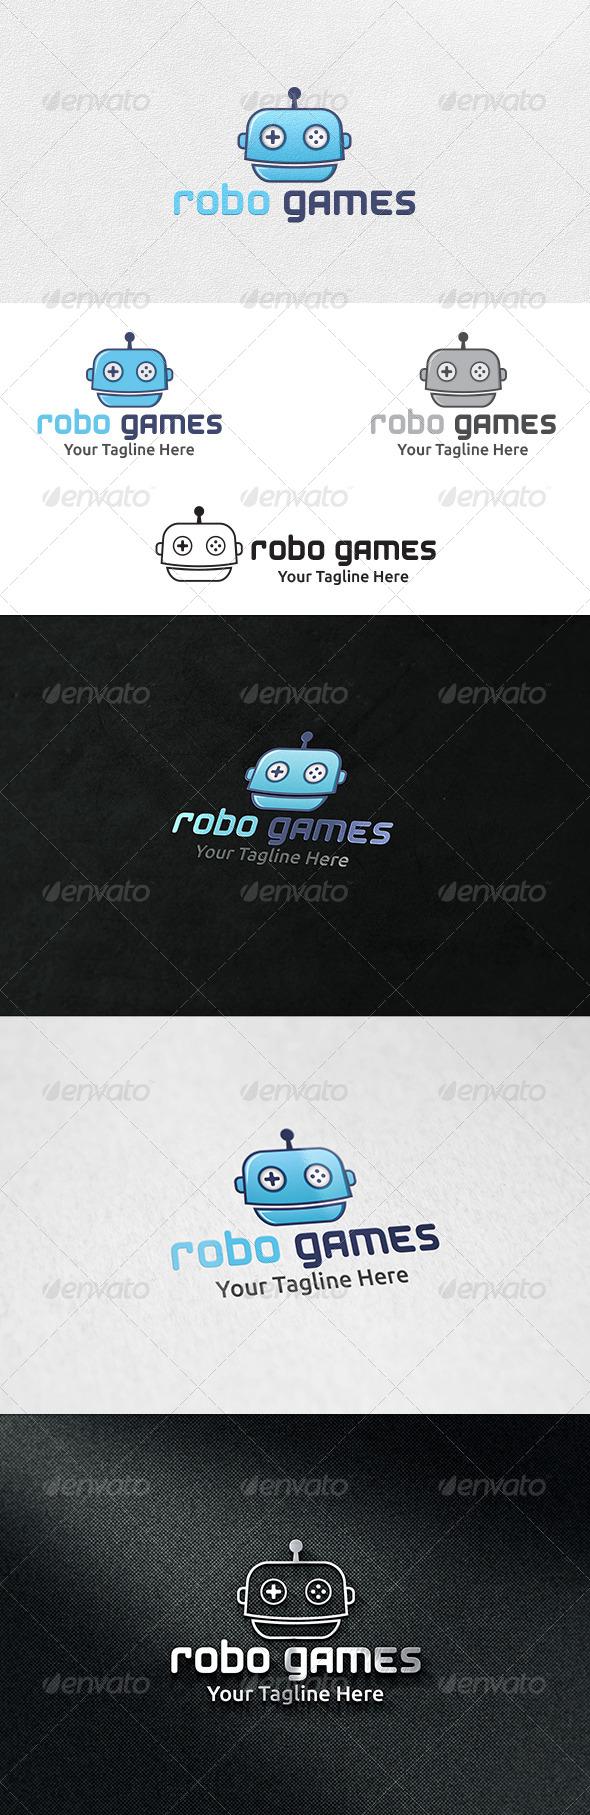 Robot Games - Logo Template - Symbols Logo Templates